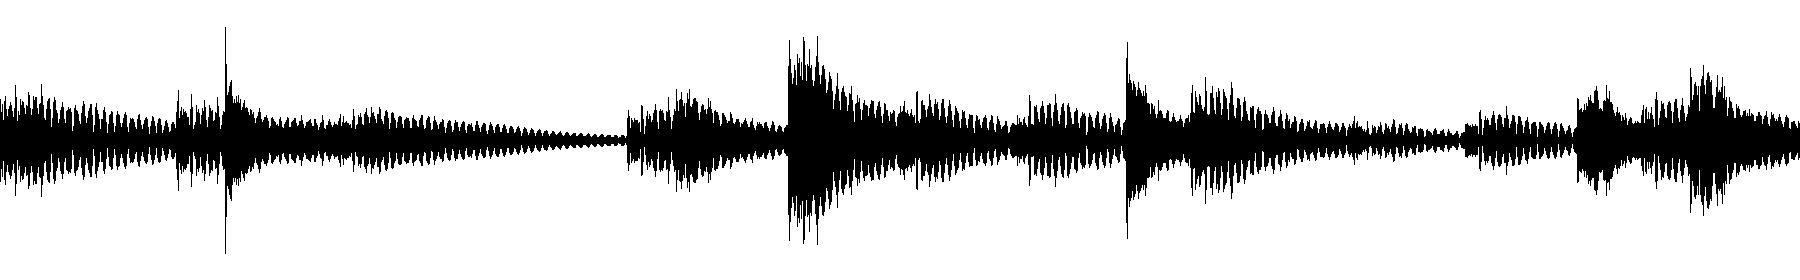 g abs05 095